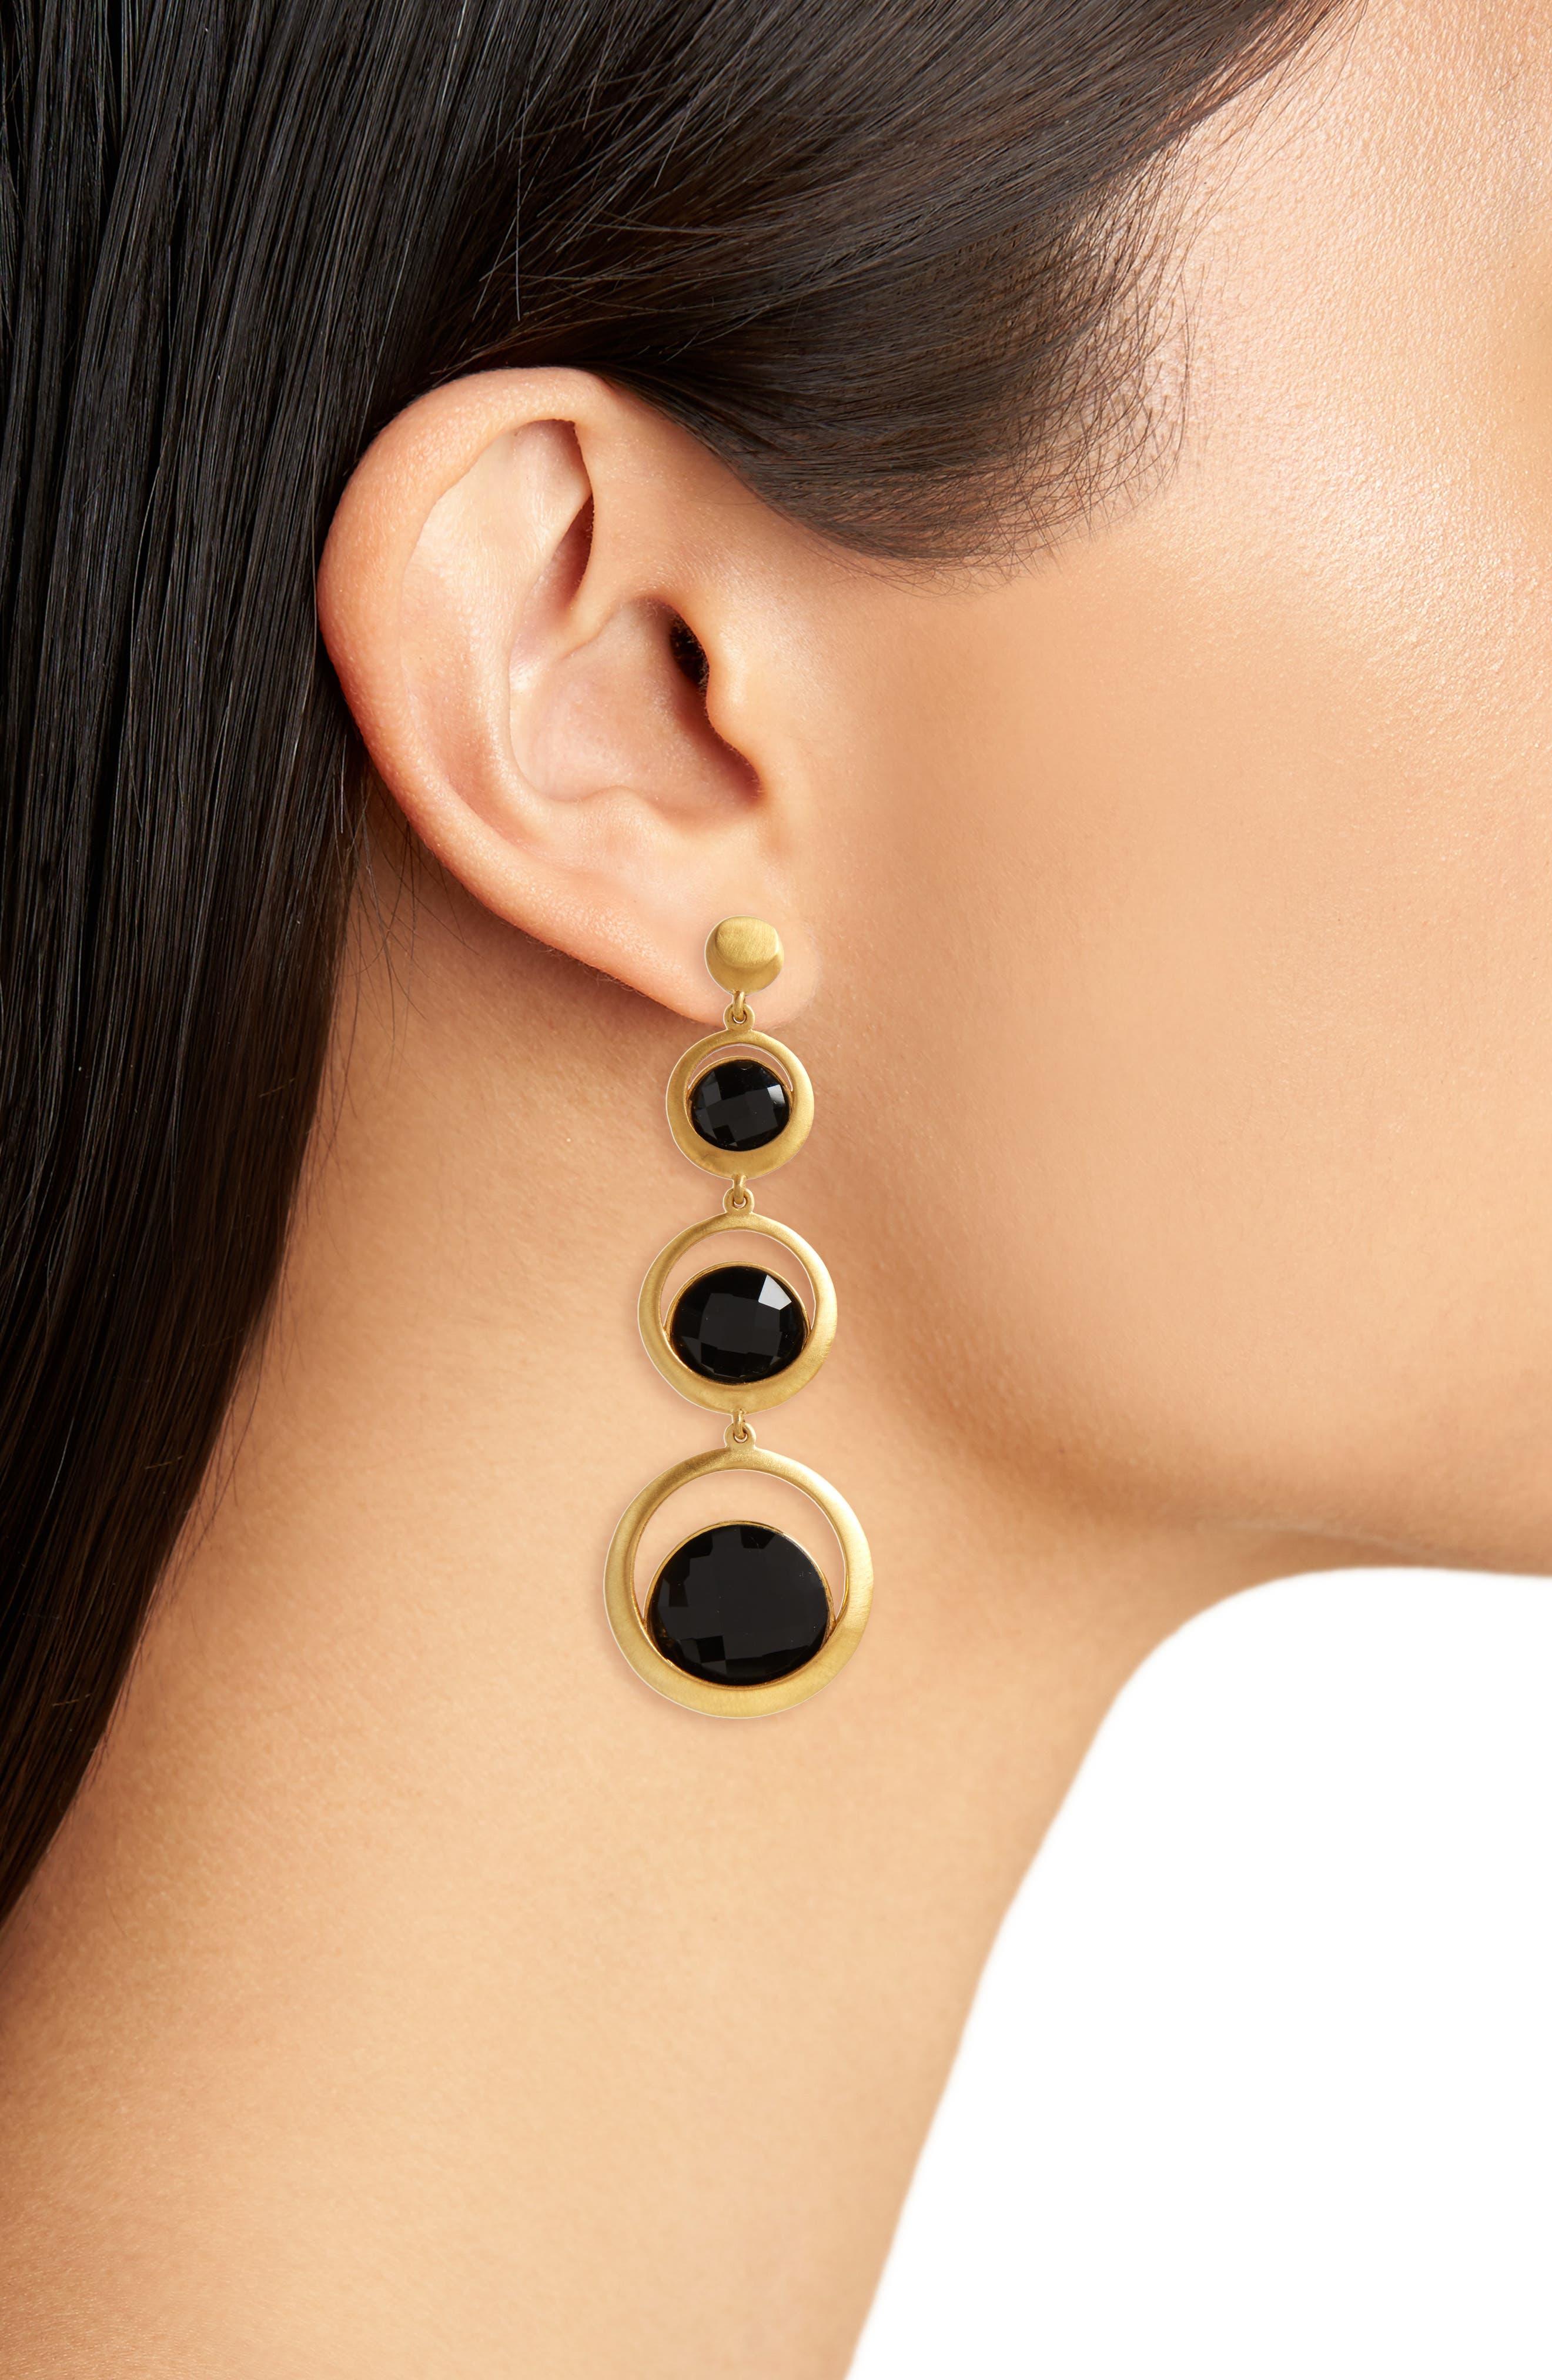 Triple Semiprecious Stone Drop Earrings,                             Alternate thumbnail 2, color,                             Black Onyx/ Gold